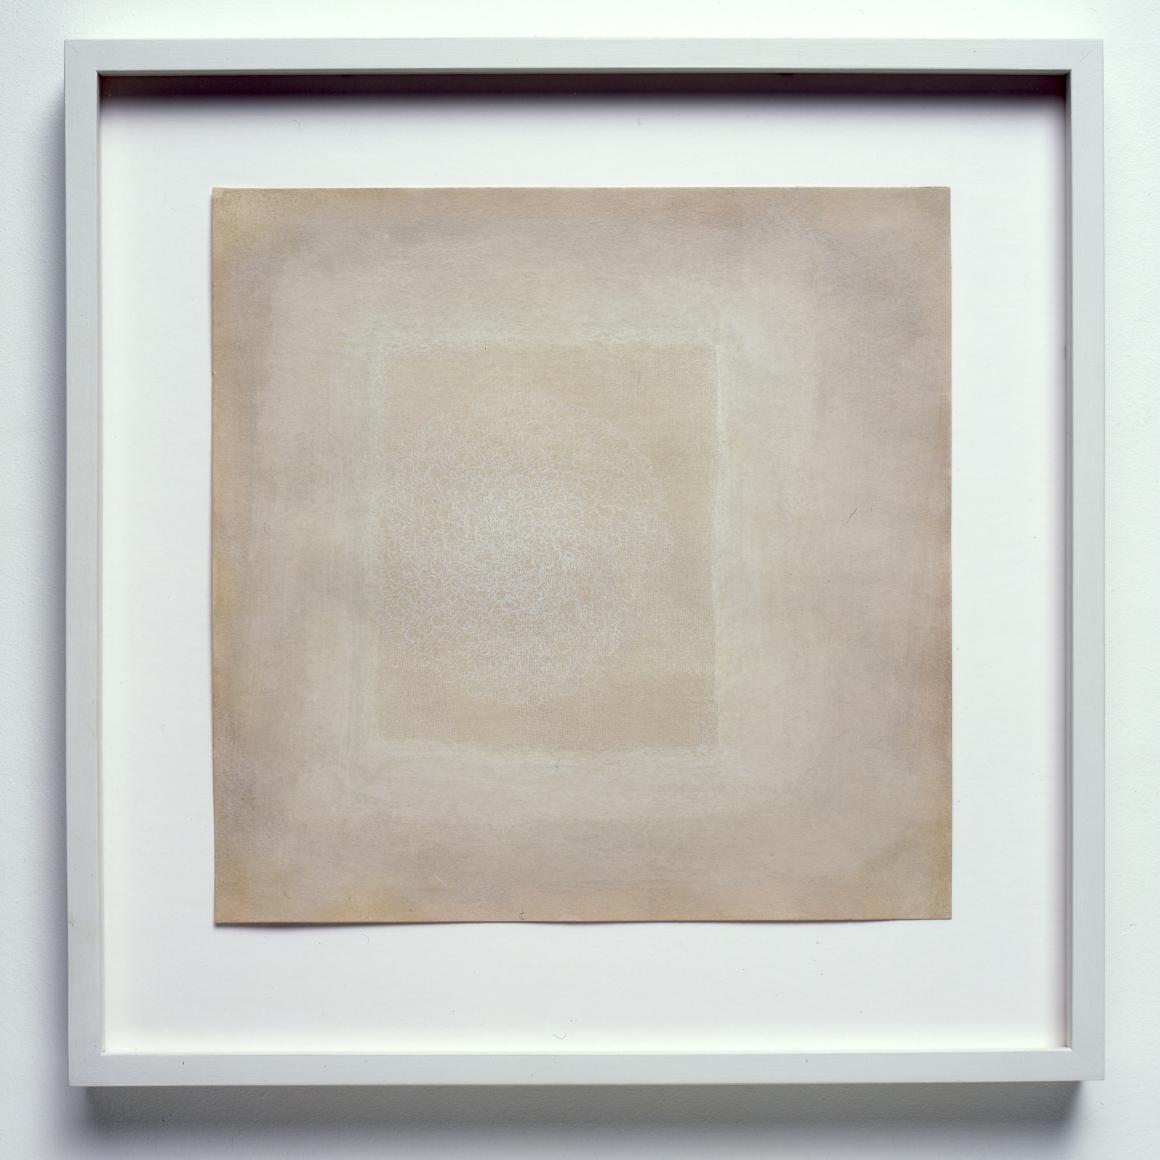 SHIRAZEH HOUSHIARY, Untitled (VII), 2003